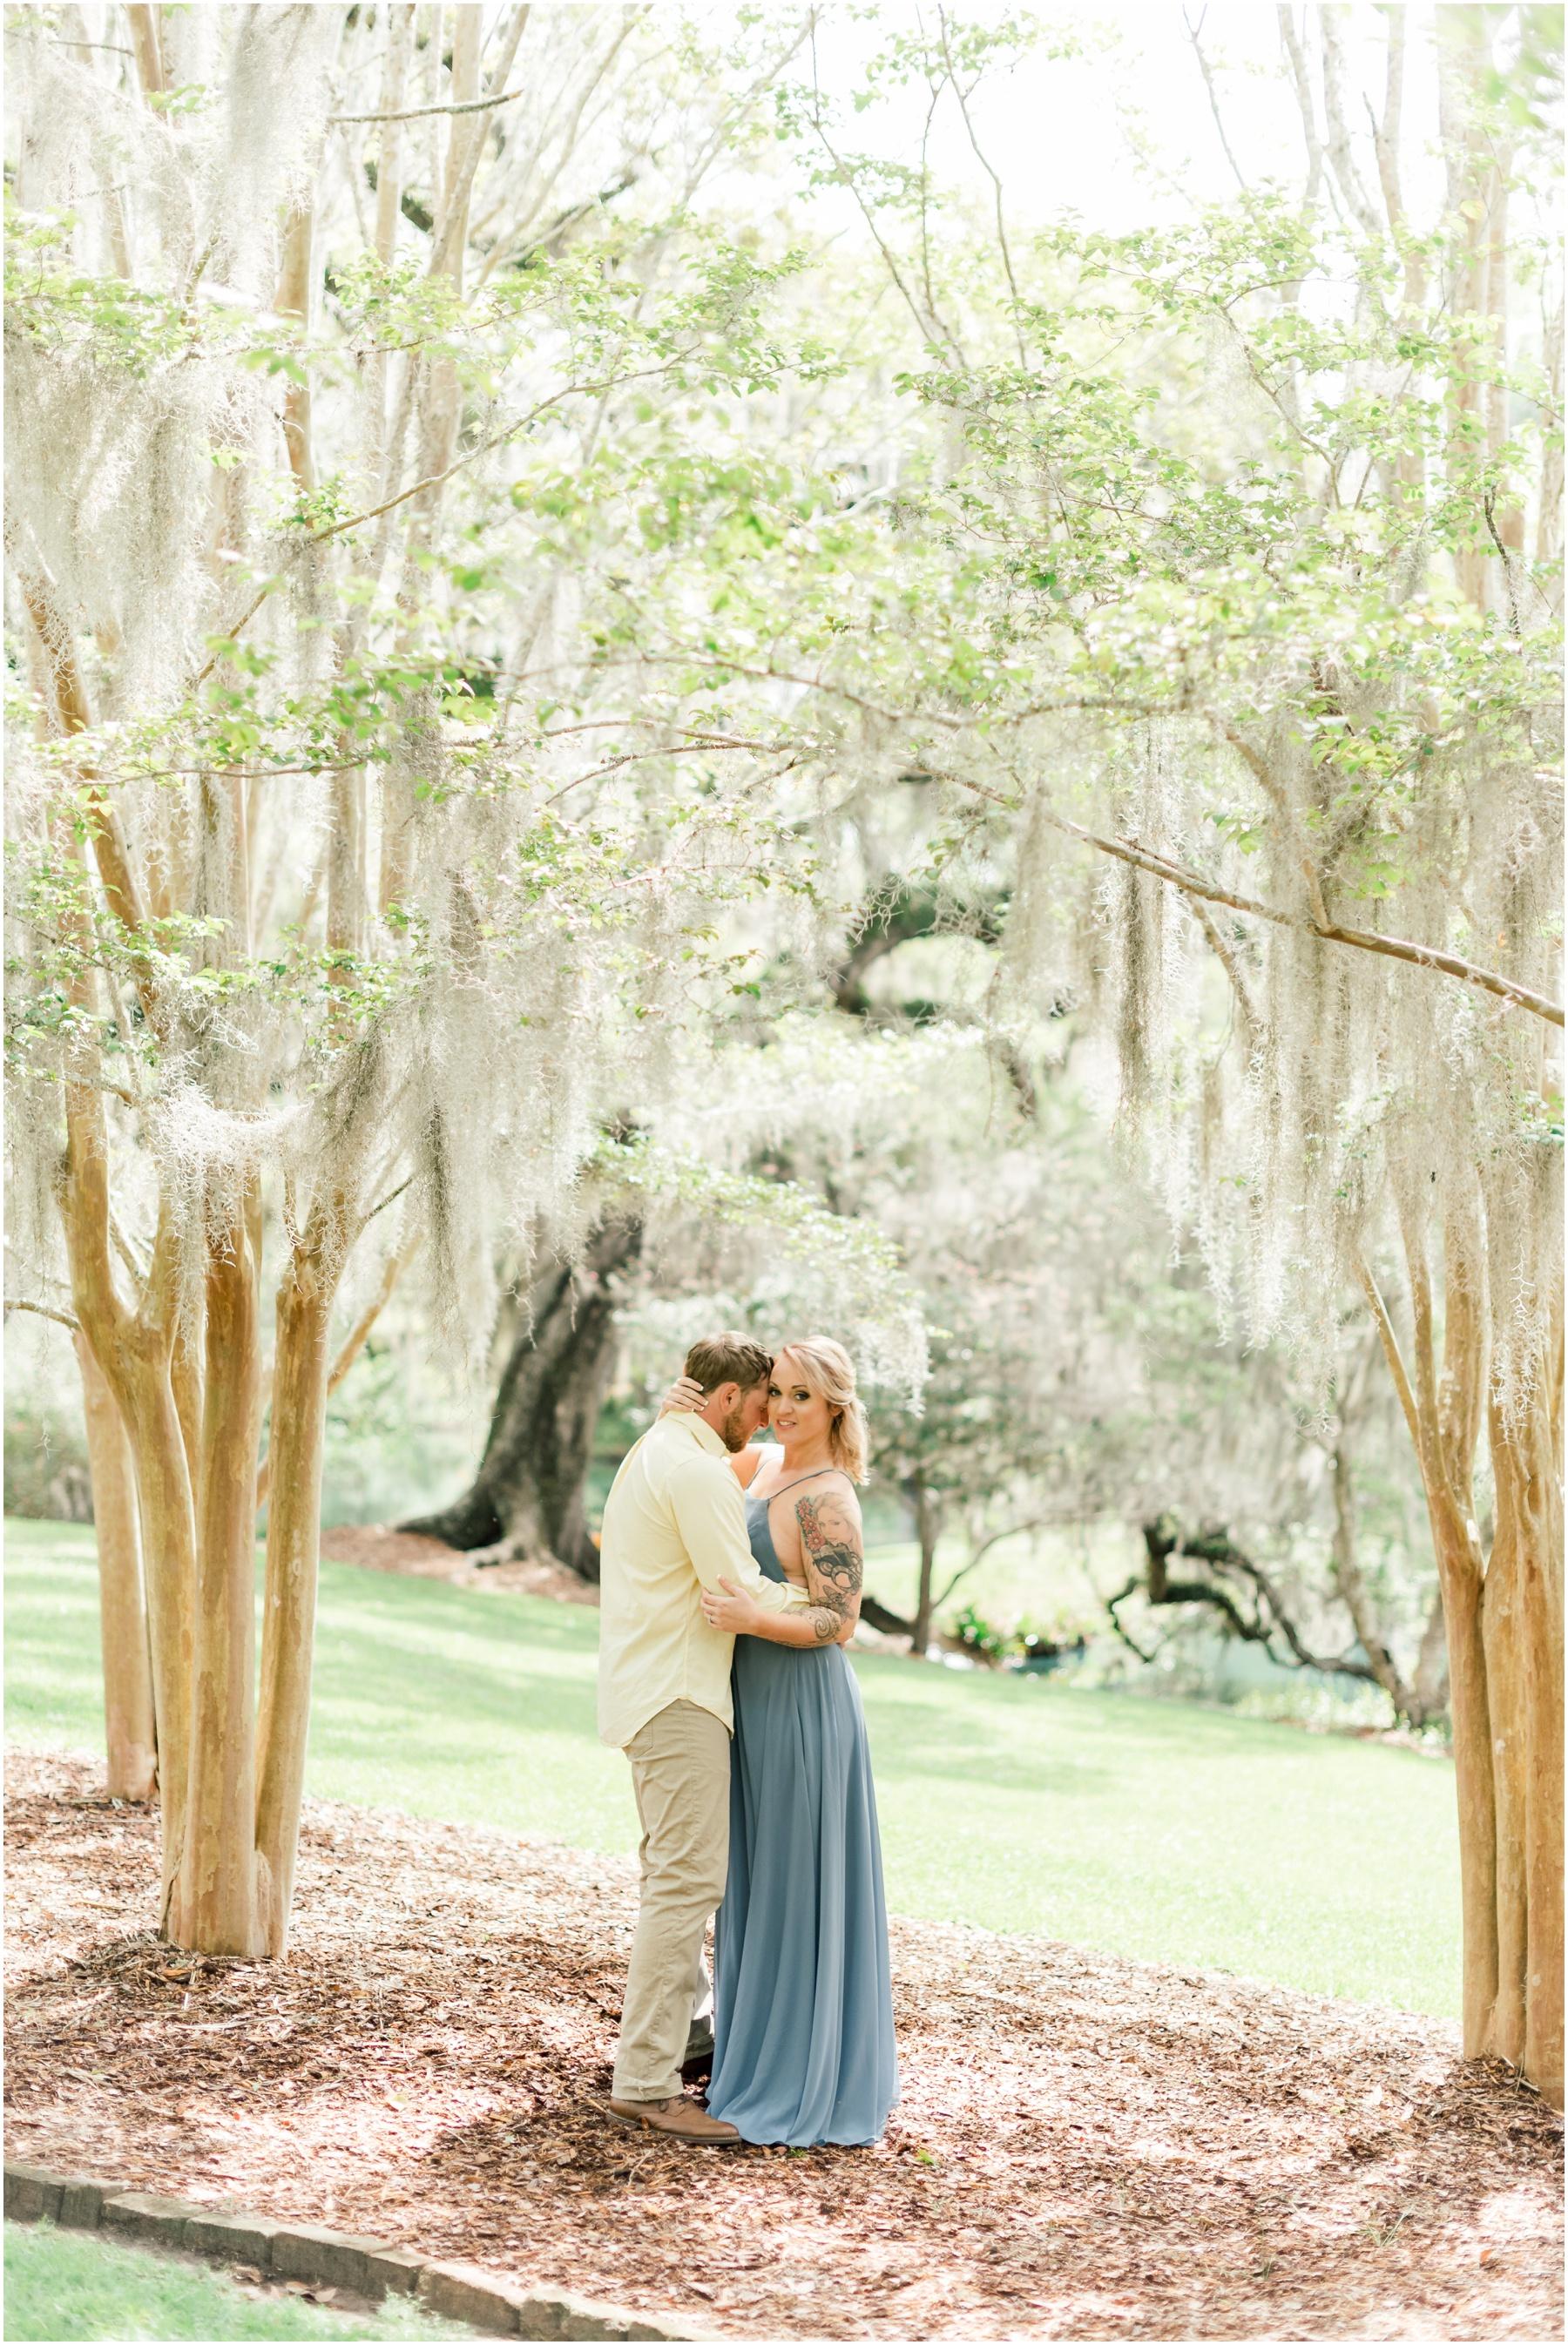 Mepkin-Abbey-Moncks-Corner-South-Carolina-Engagement-Session-Photos_0008.jpg